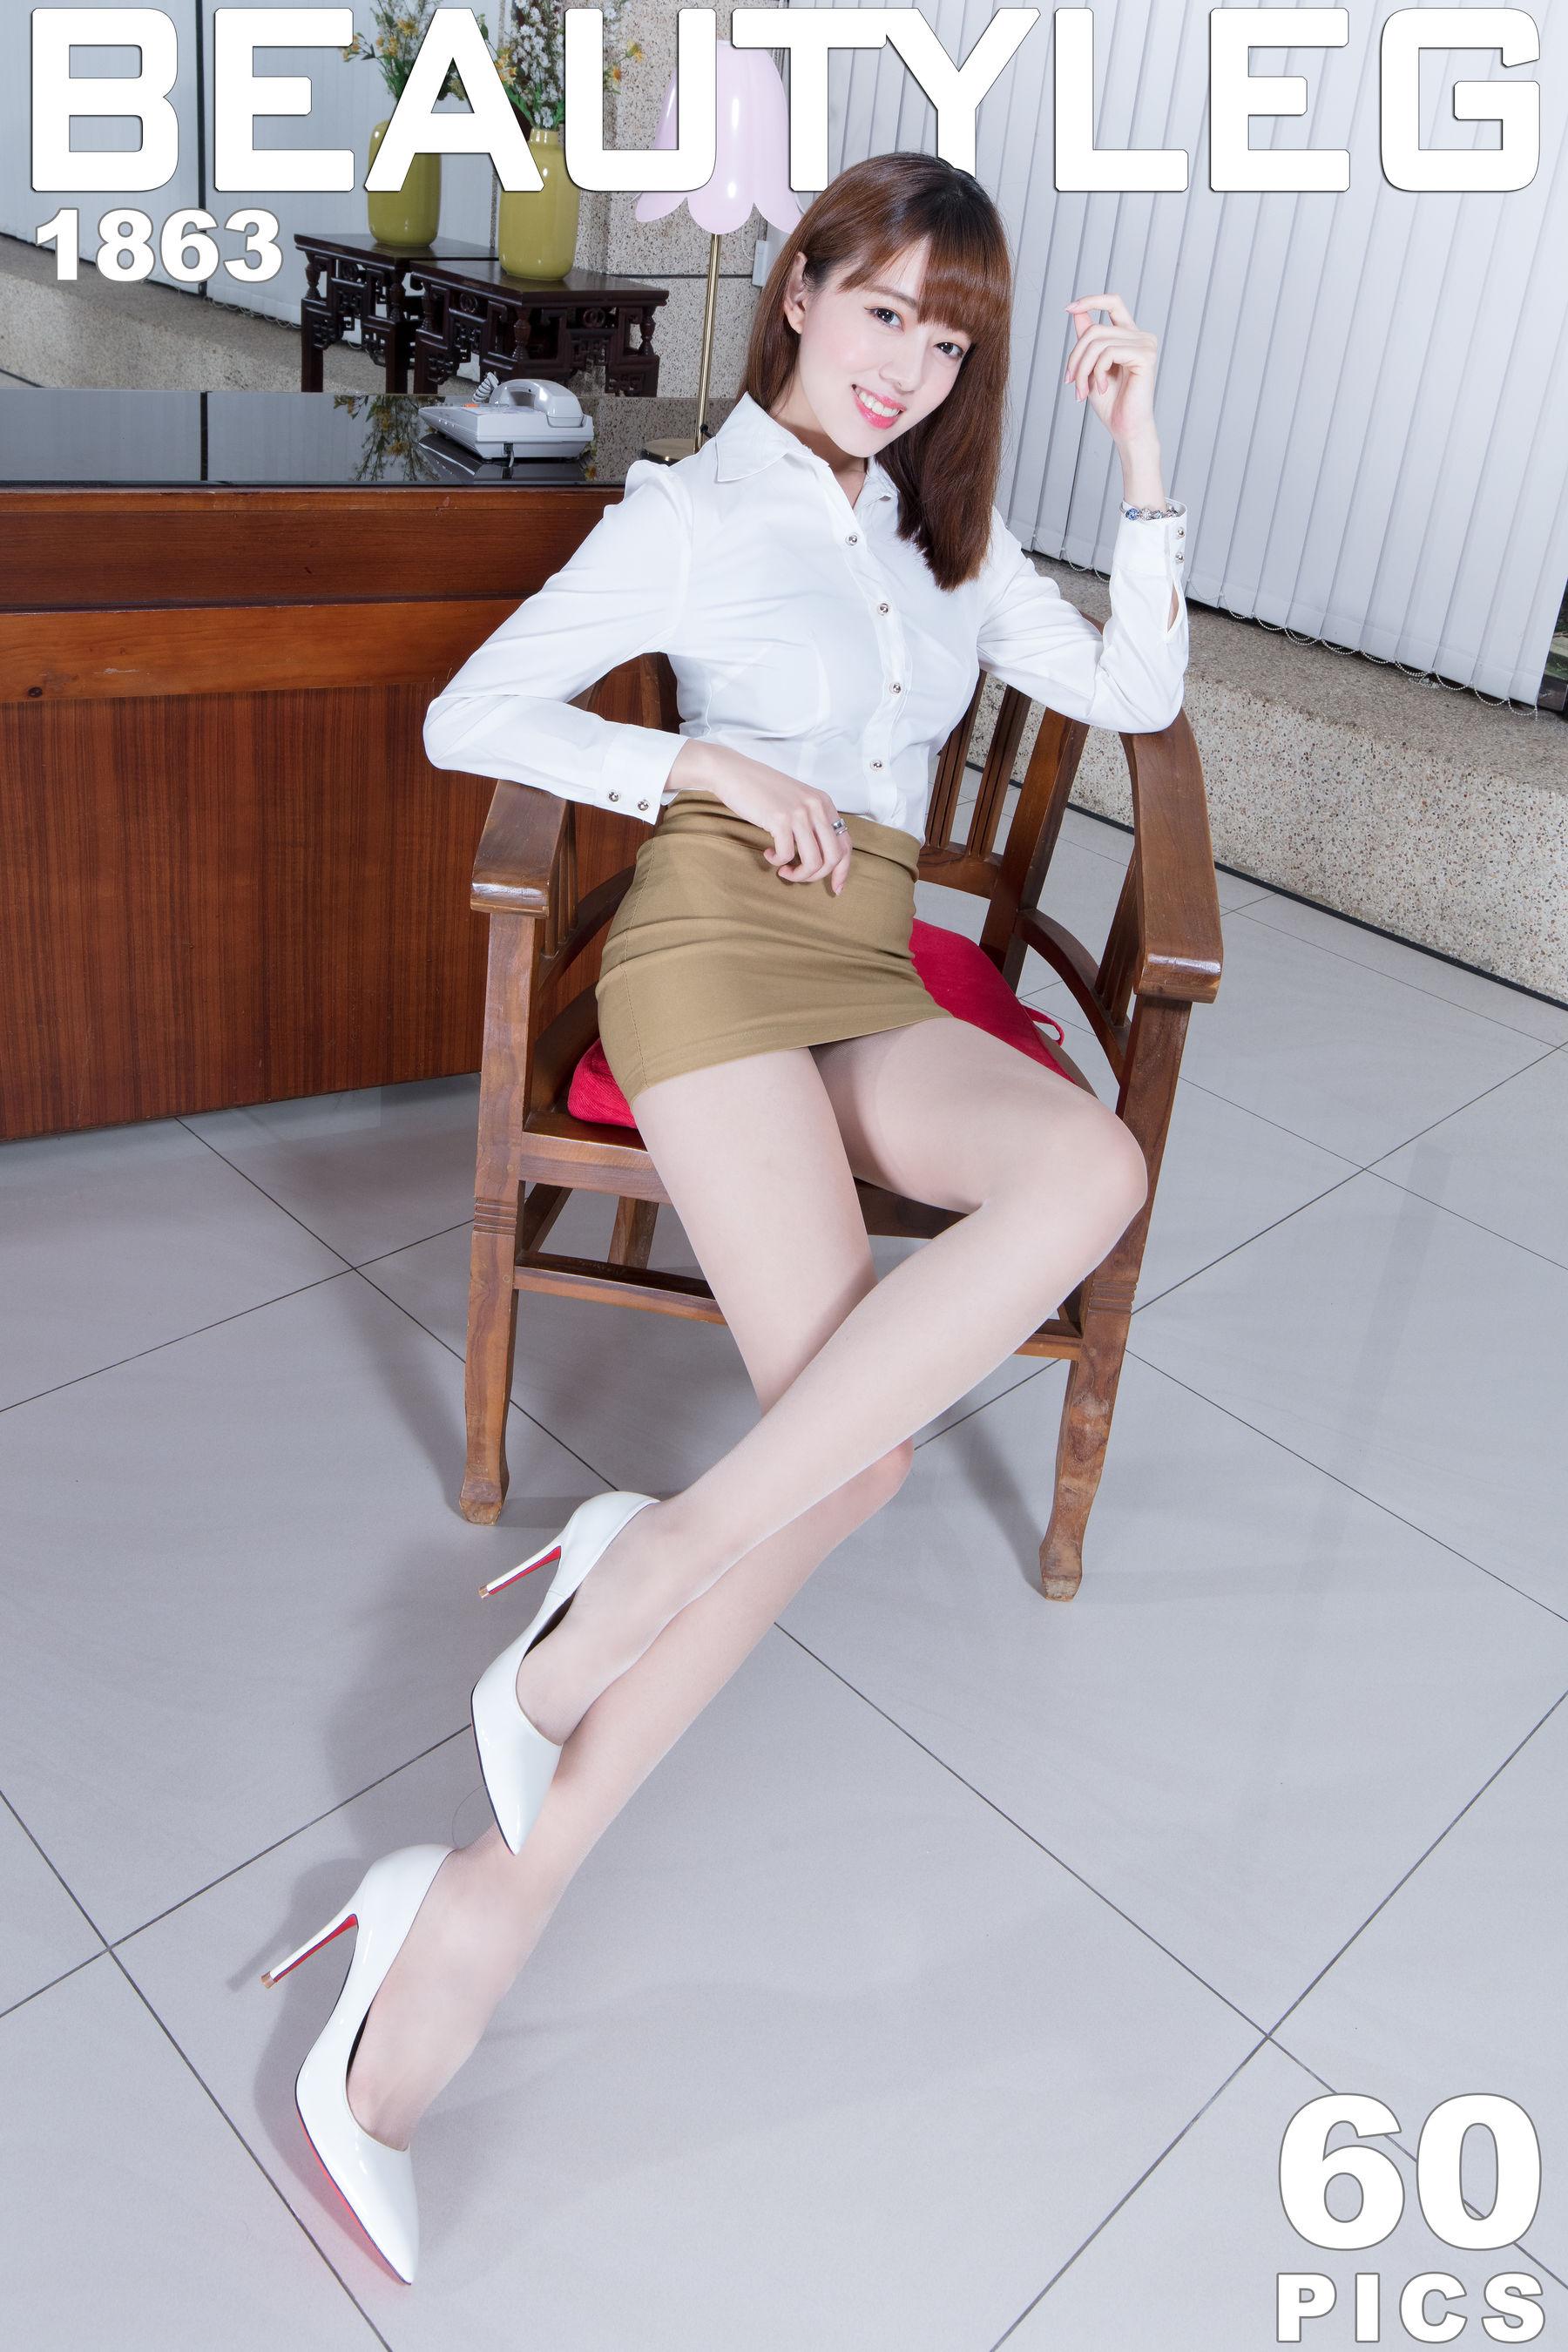 VOL.1629 [Beautyleg]制服美腿高跟:腿模Anonymity超高清个人性感漂亮大图(60P)